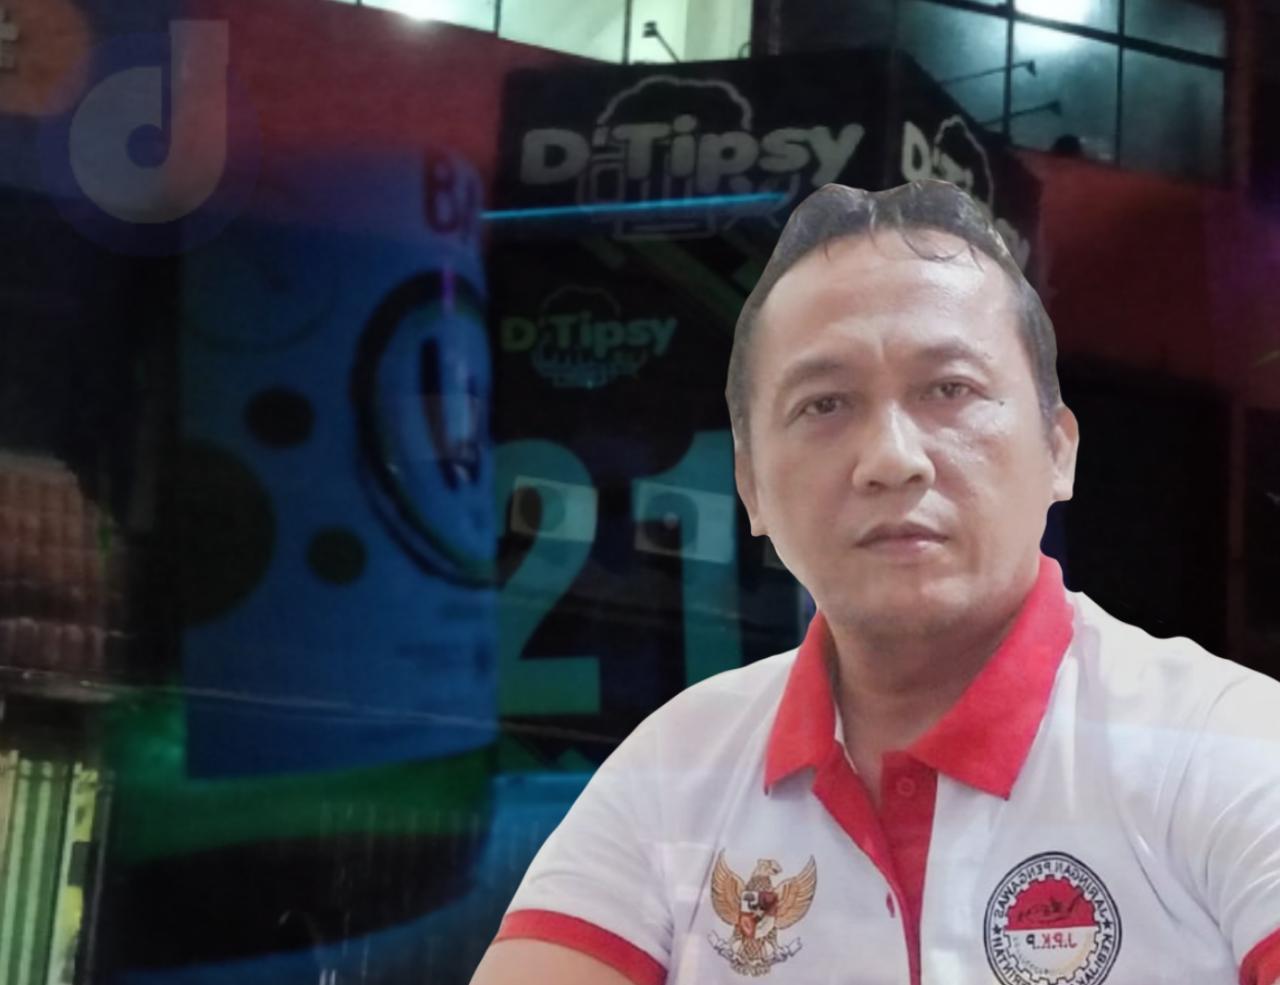 Kafe D'Tipsy Tak Kunjung Ditutup, J.P.K.P Jabar Mencium Aroma Dugaan Kongkalingkong Oknum Pejabat Disperindag